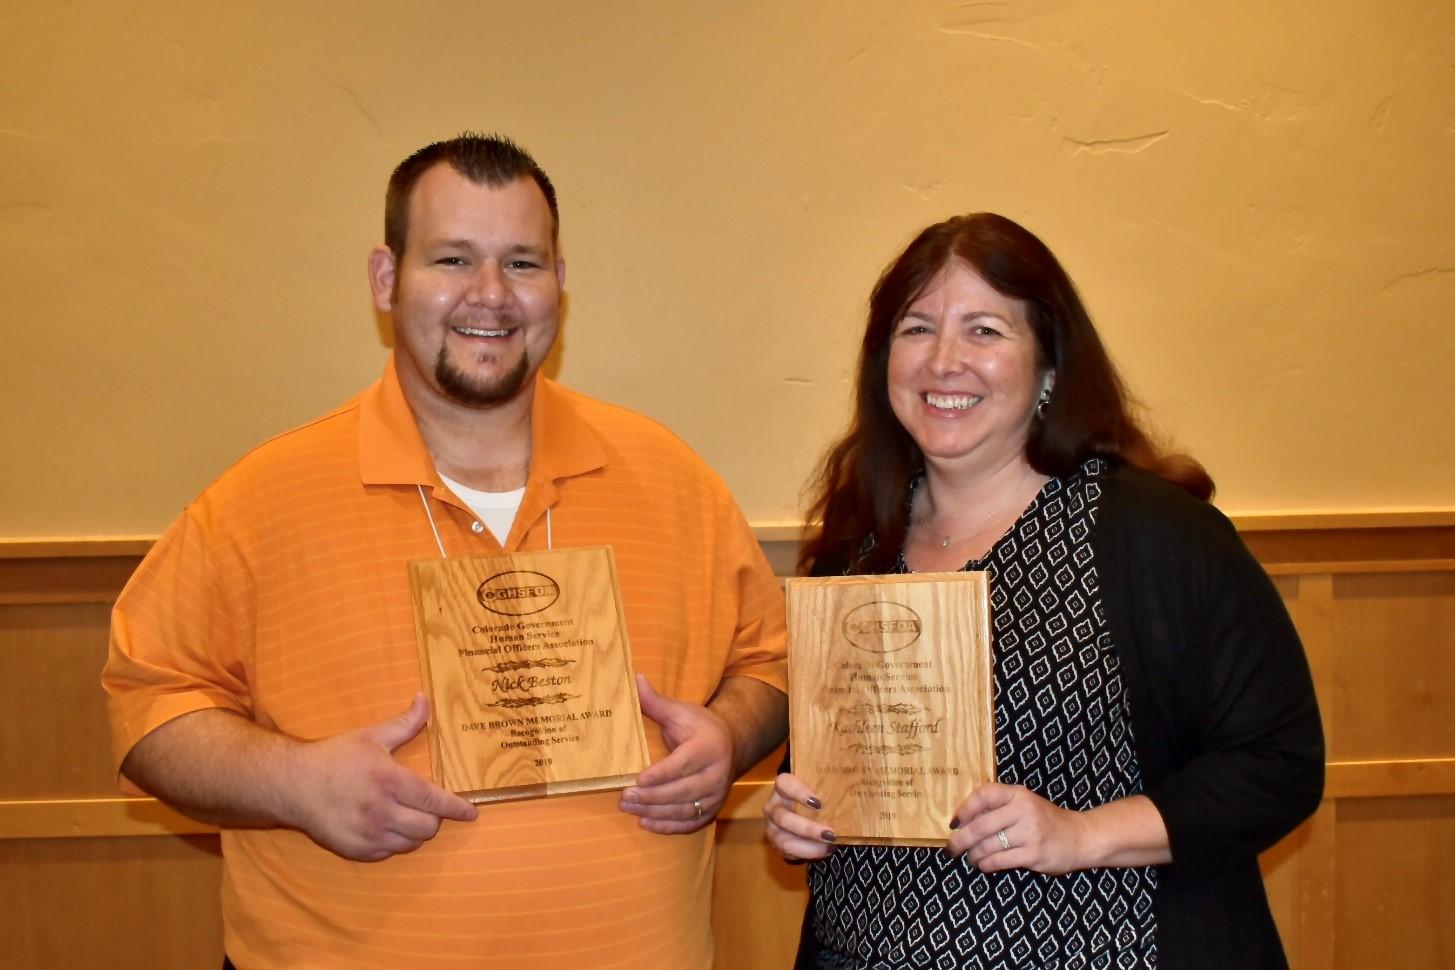 Nick Beston (Adams County) and Kathleen Stafford (Arapahoe County)